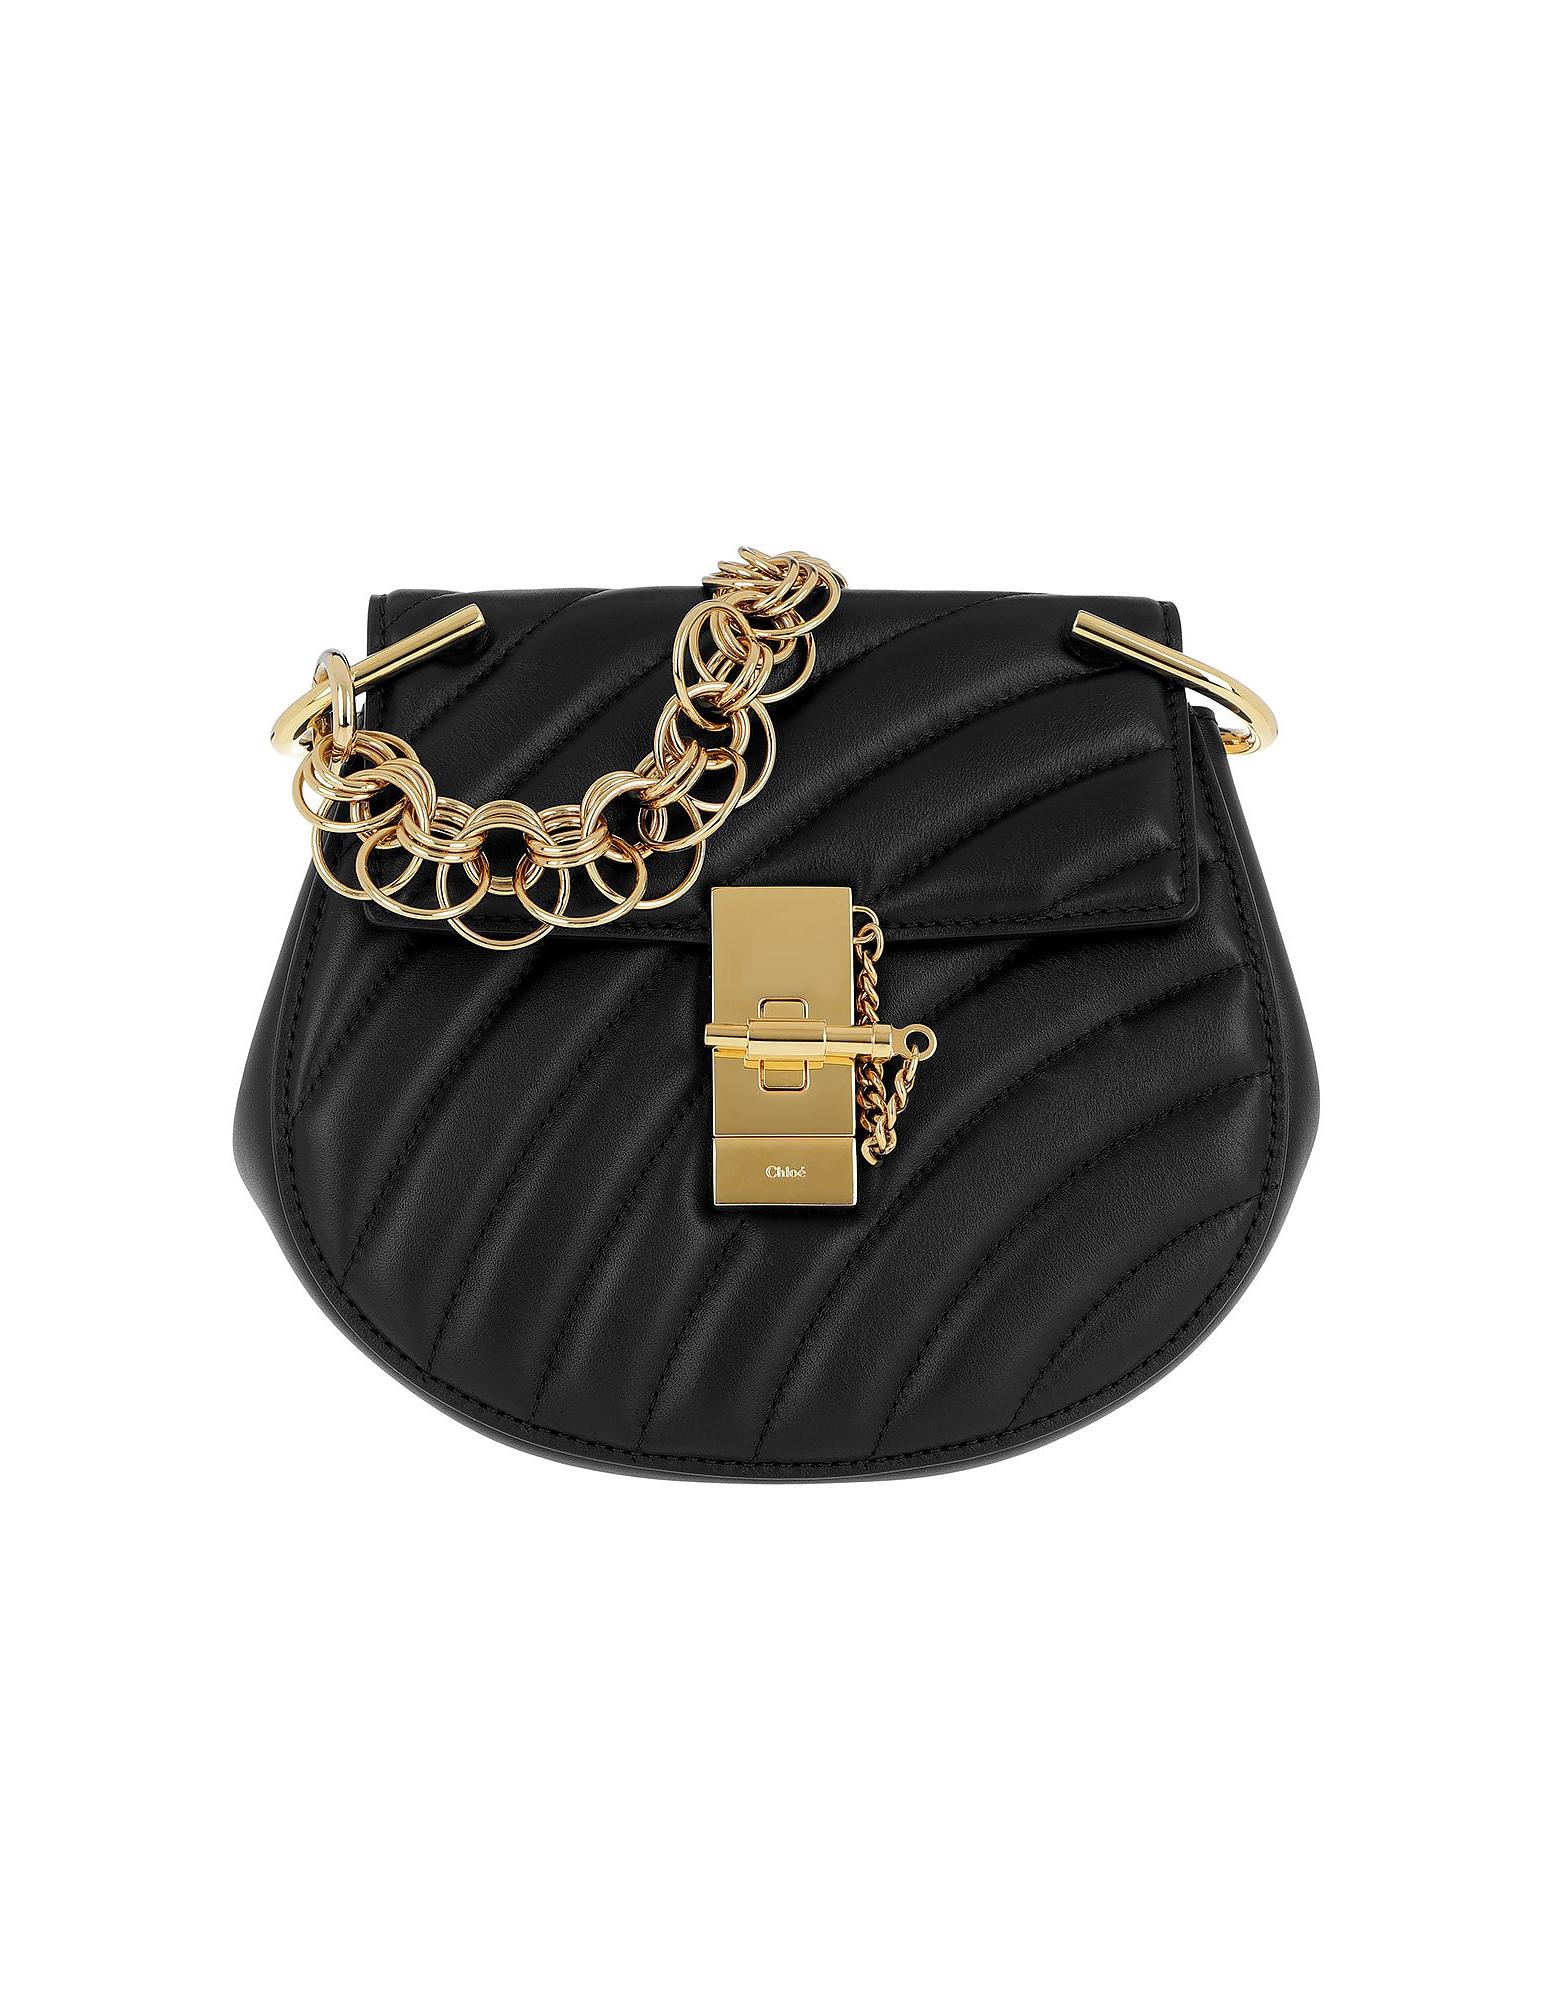 Drew Bijou Mini Leather Black